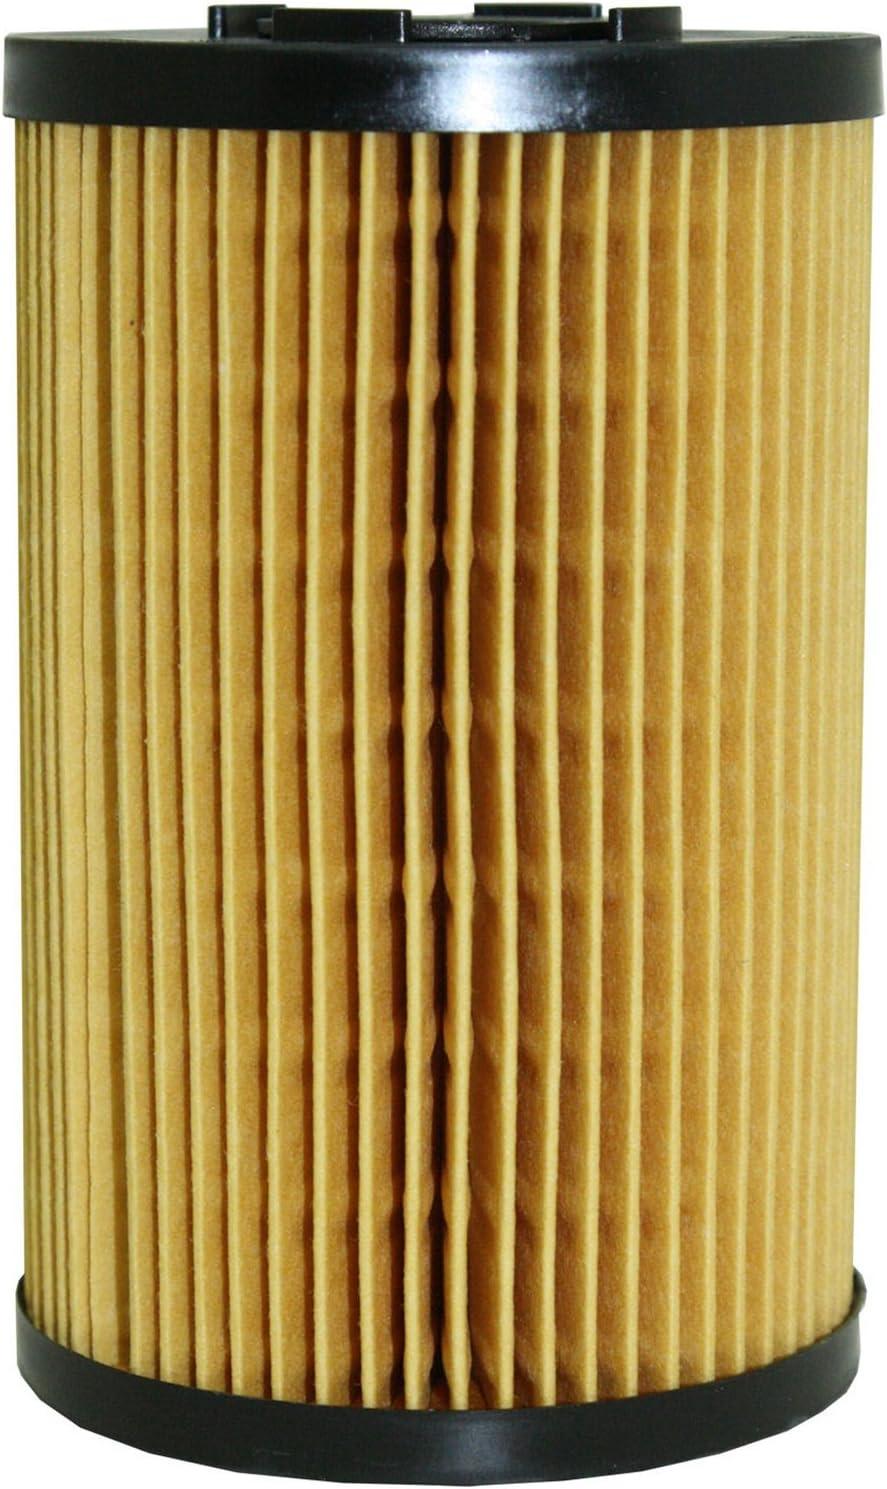 Luber-finer LP2214 Heavy Duty Oil Filter